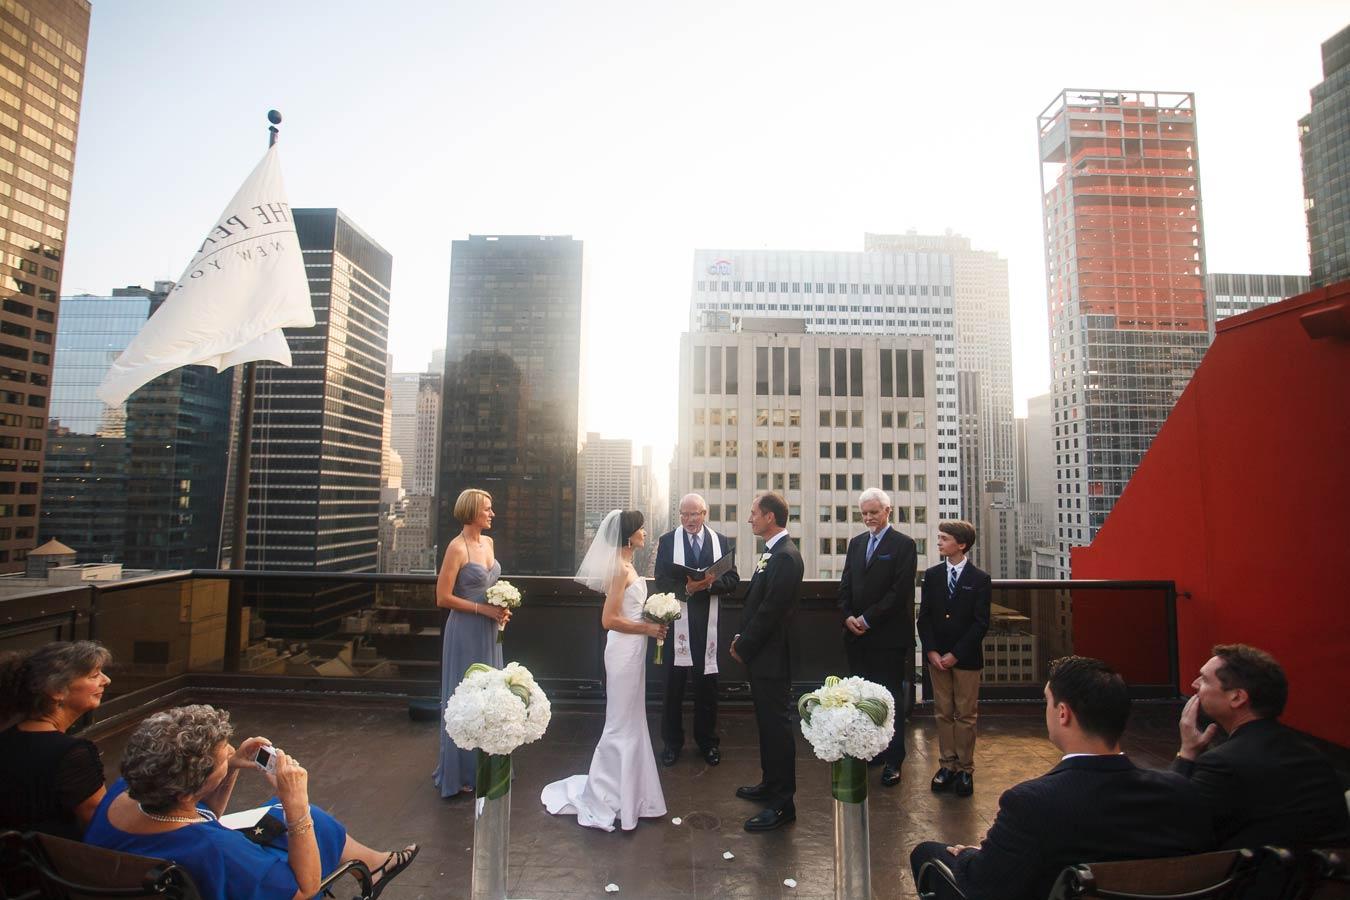 peninsula-hotel-yc-wedding-photographer0075.jpg